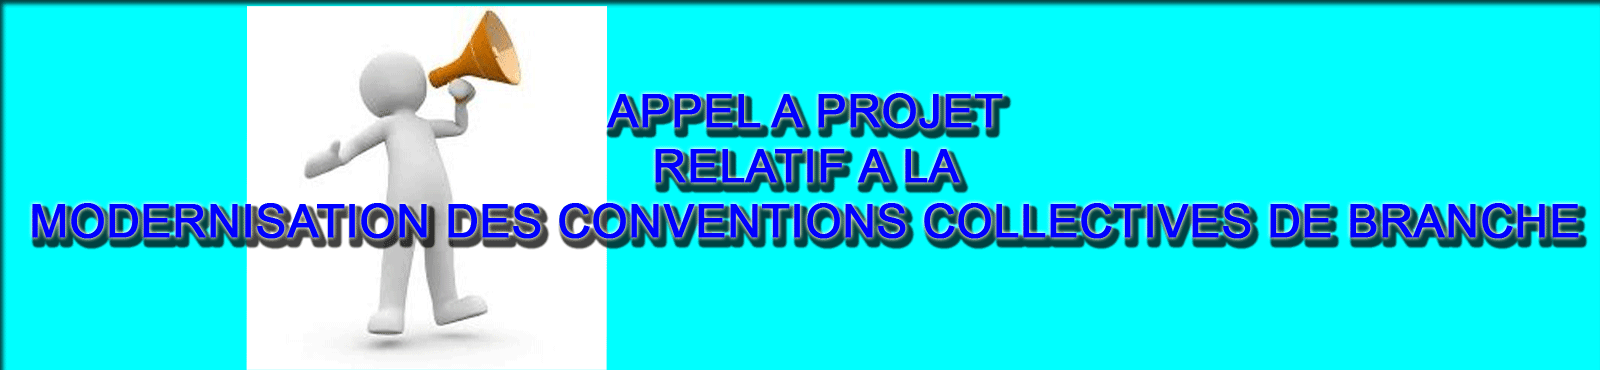 20190426CD_image_caroussel_appel_a_projet